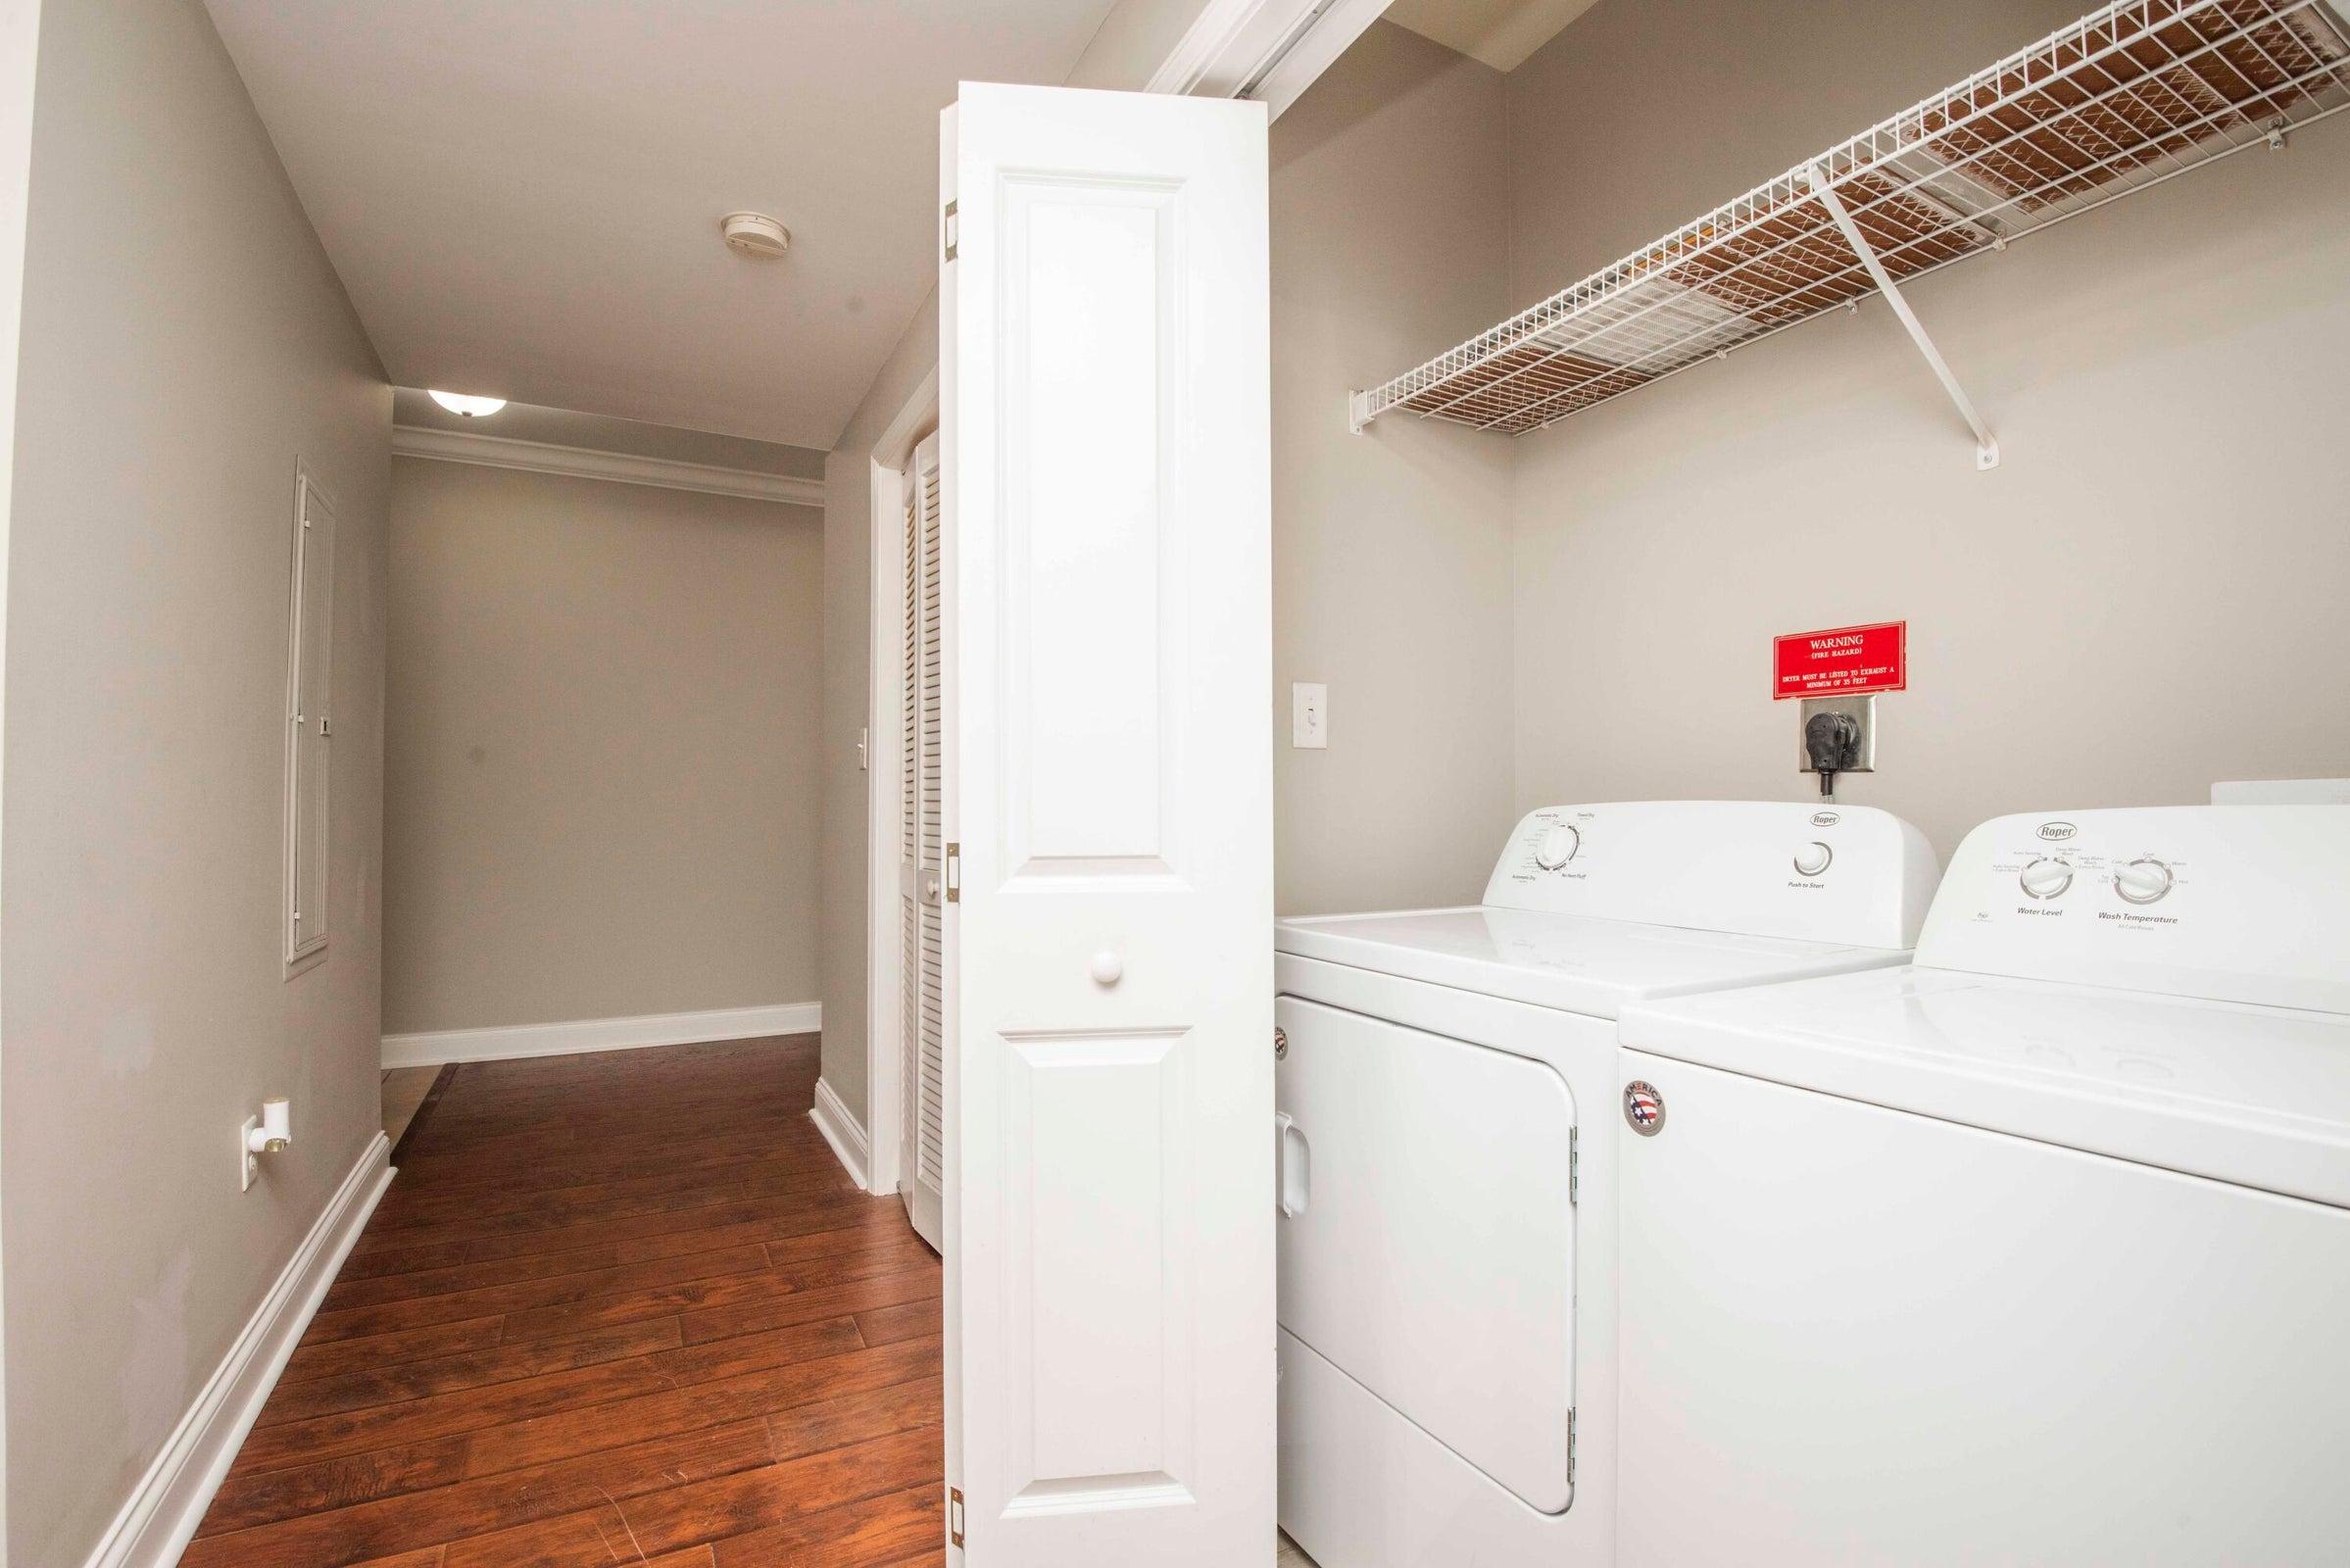 Dryer/washer convey